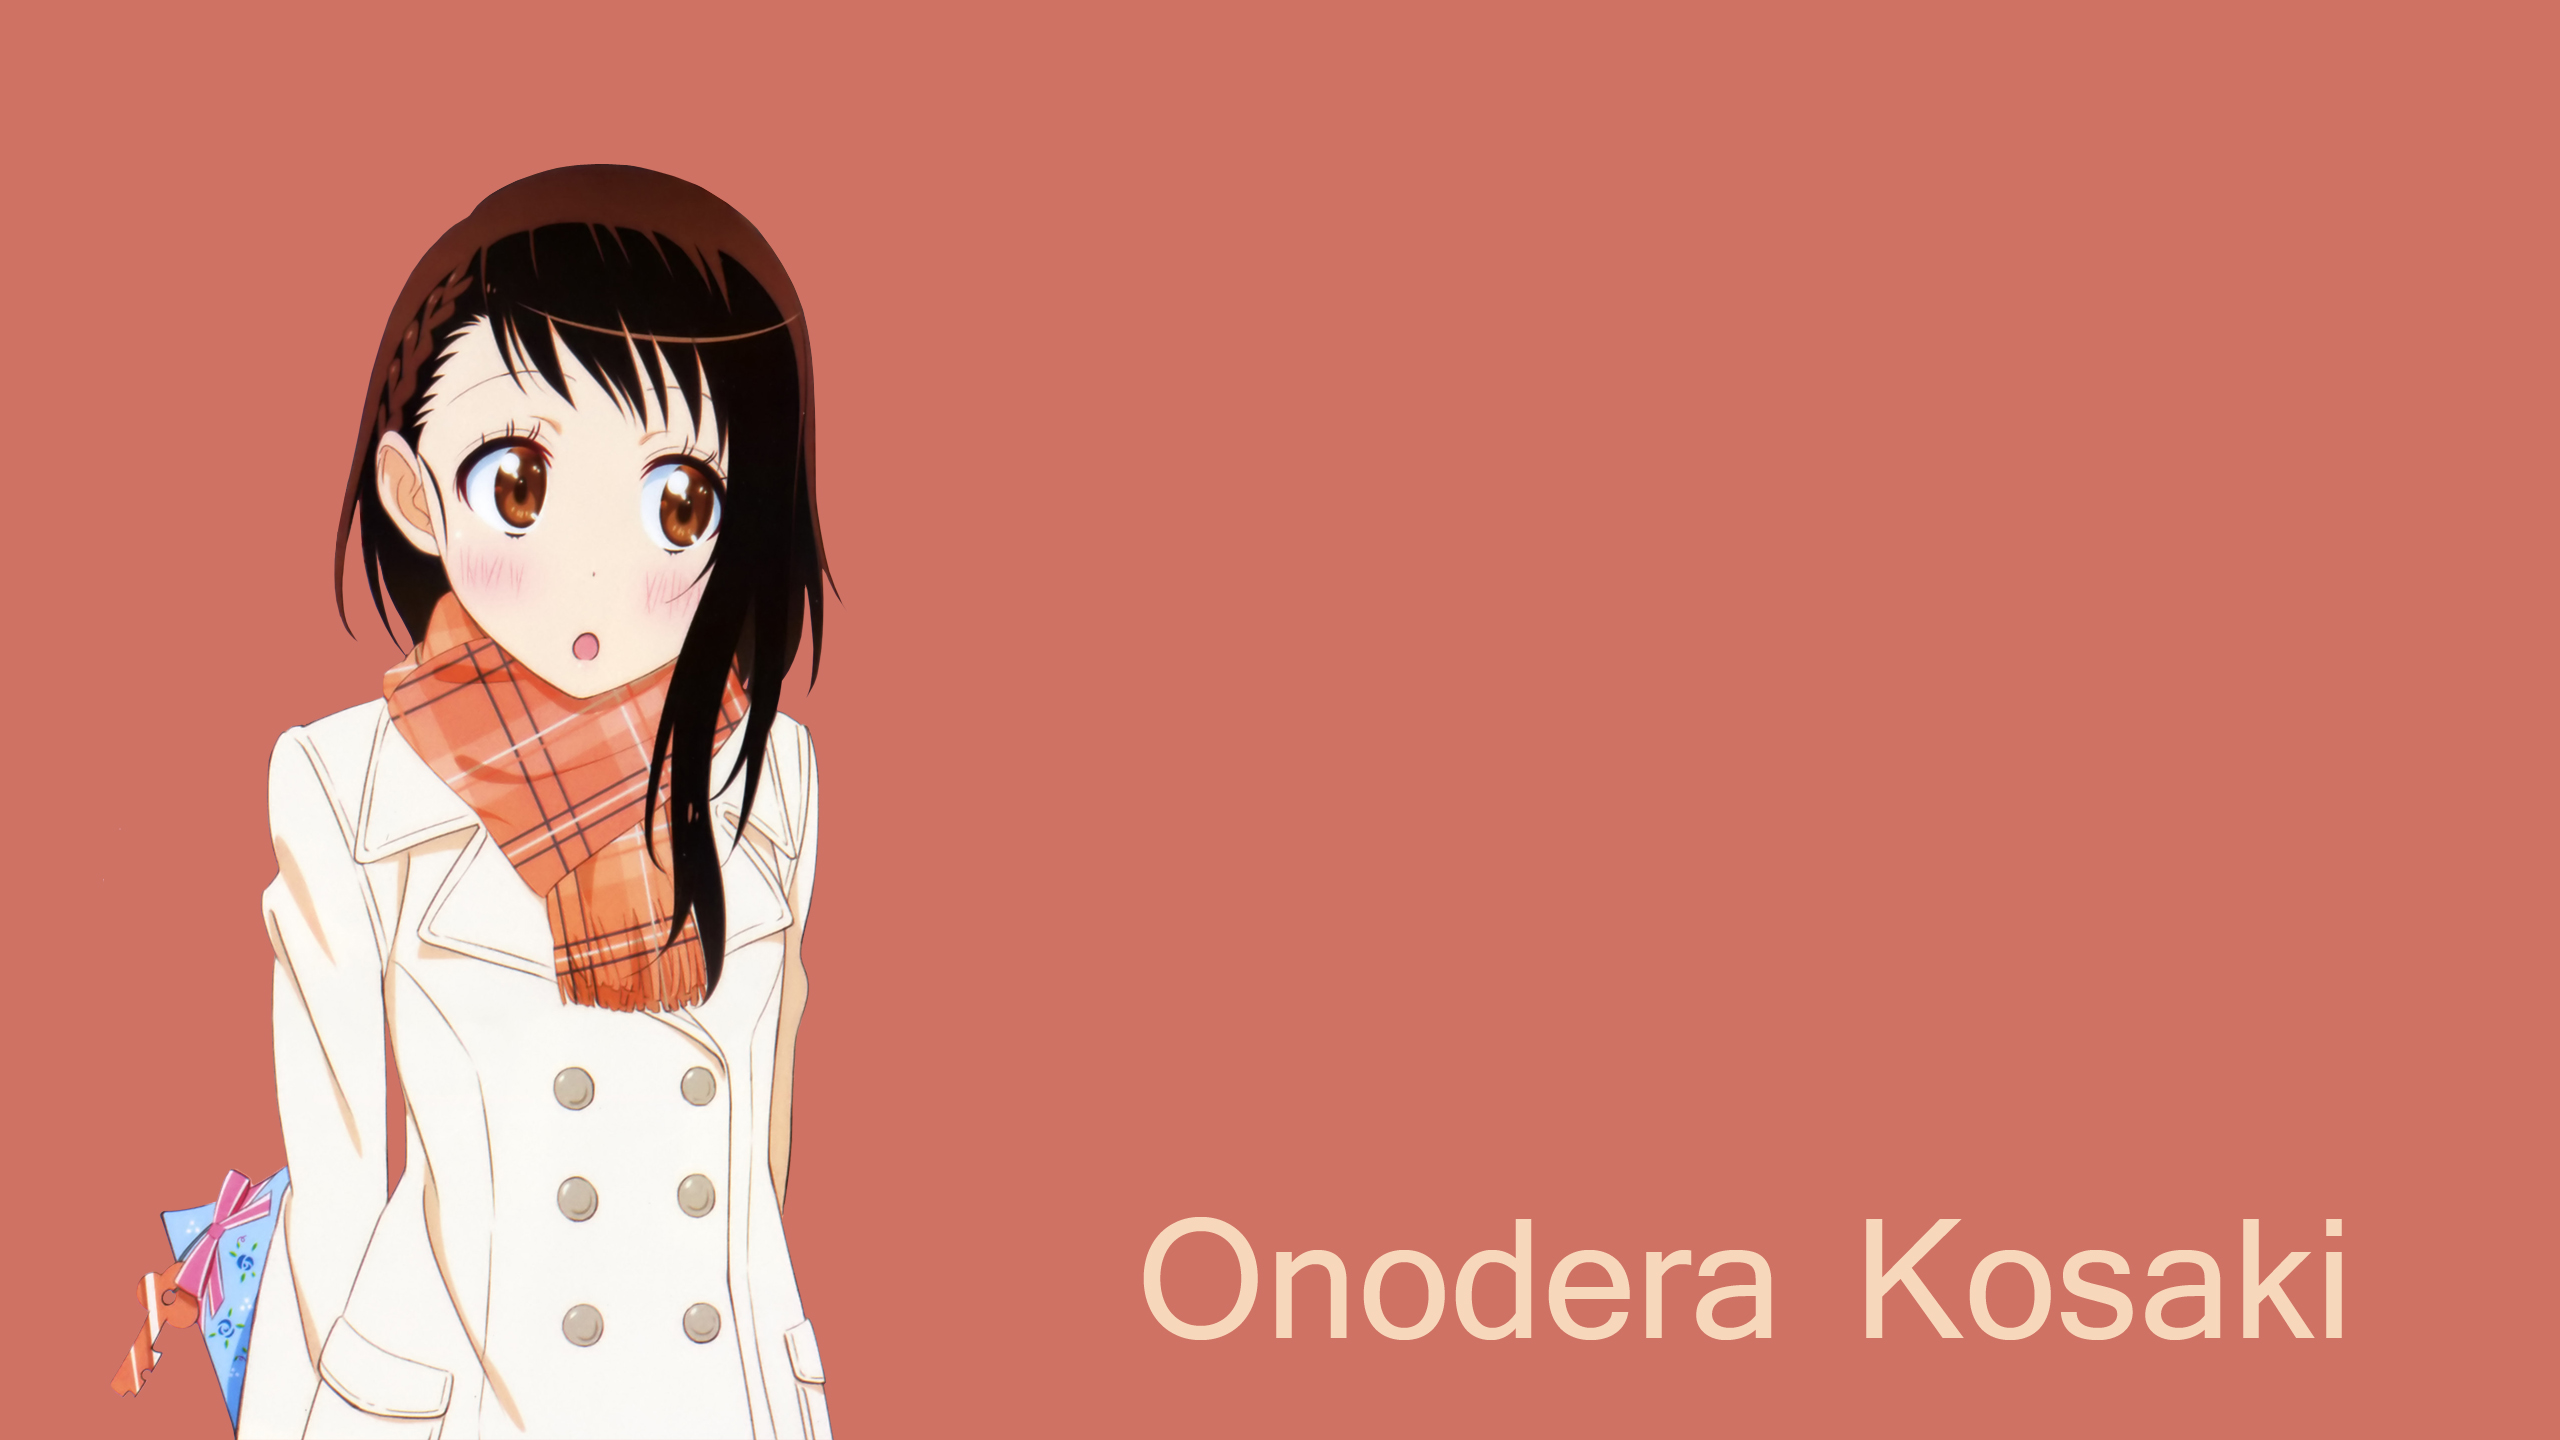 Nisekoi Anime Girls Anime Text Simple Background Wallpaper Resolution 2560x1440 Id 94 Wallha Com